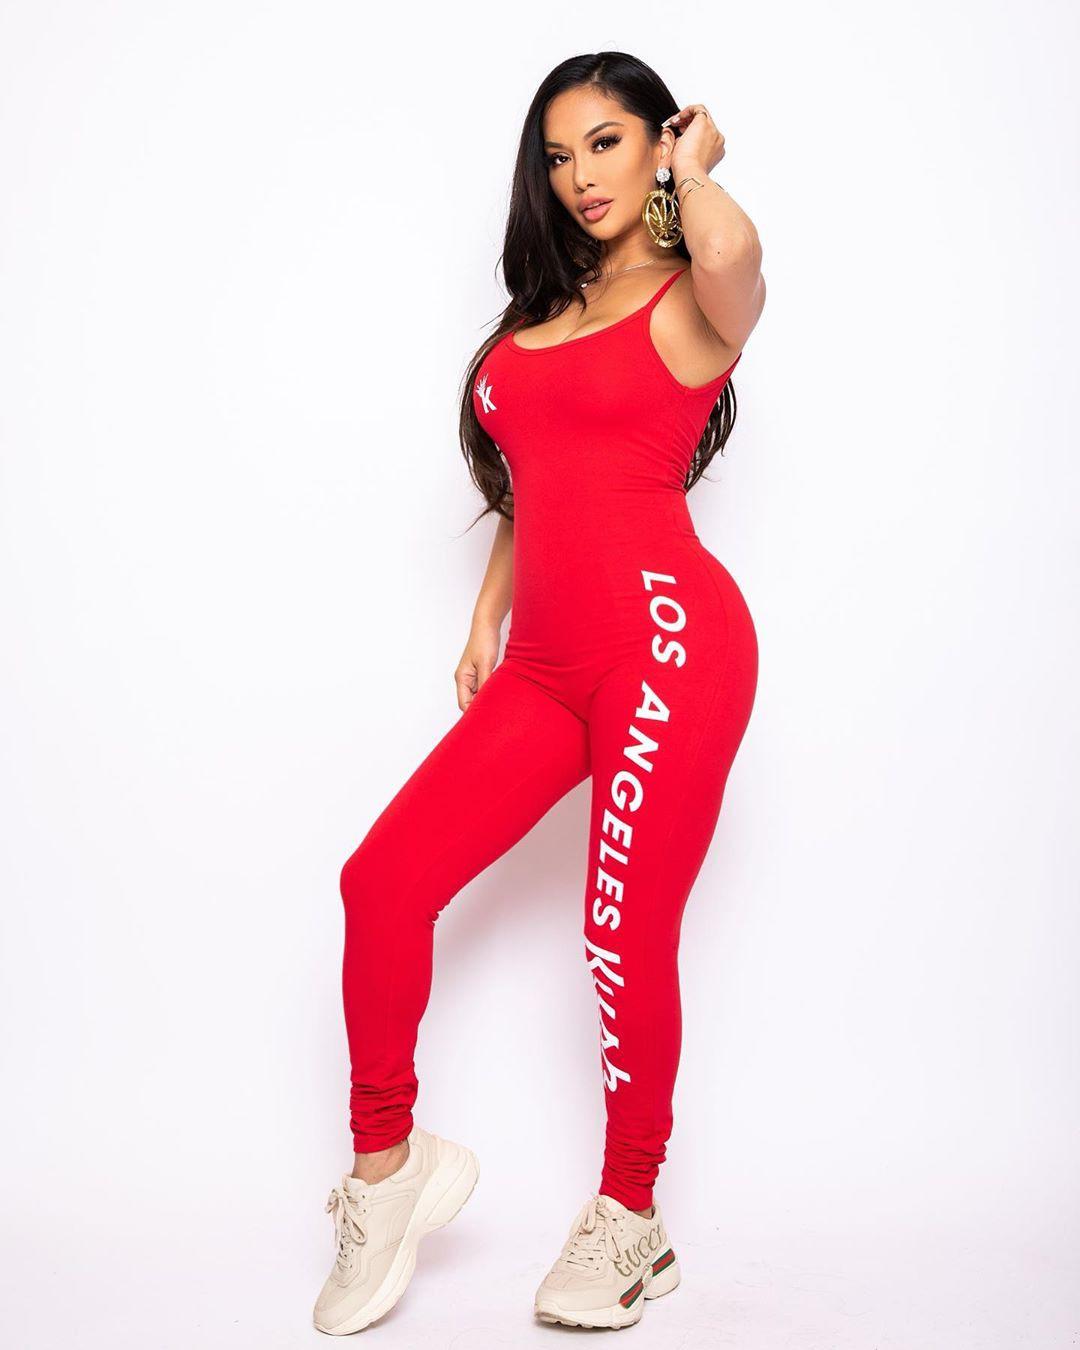 Ashley Vee sportswear, tights clothing ideas, best photoshoot ideas